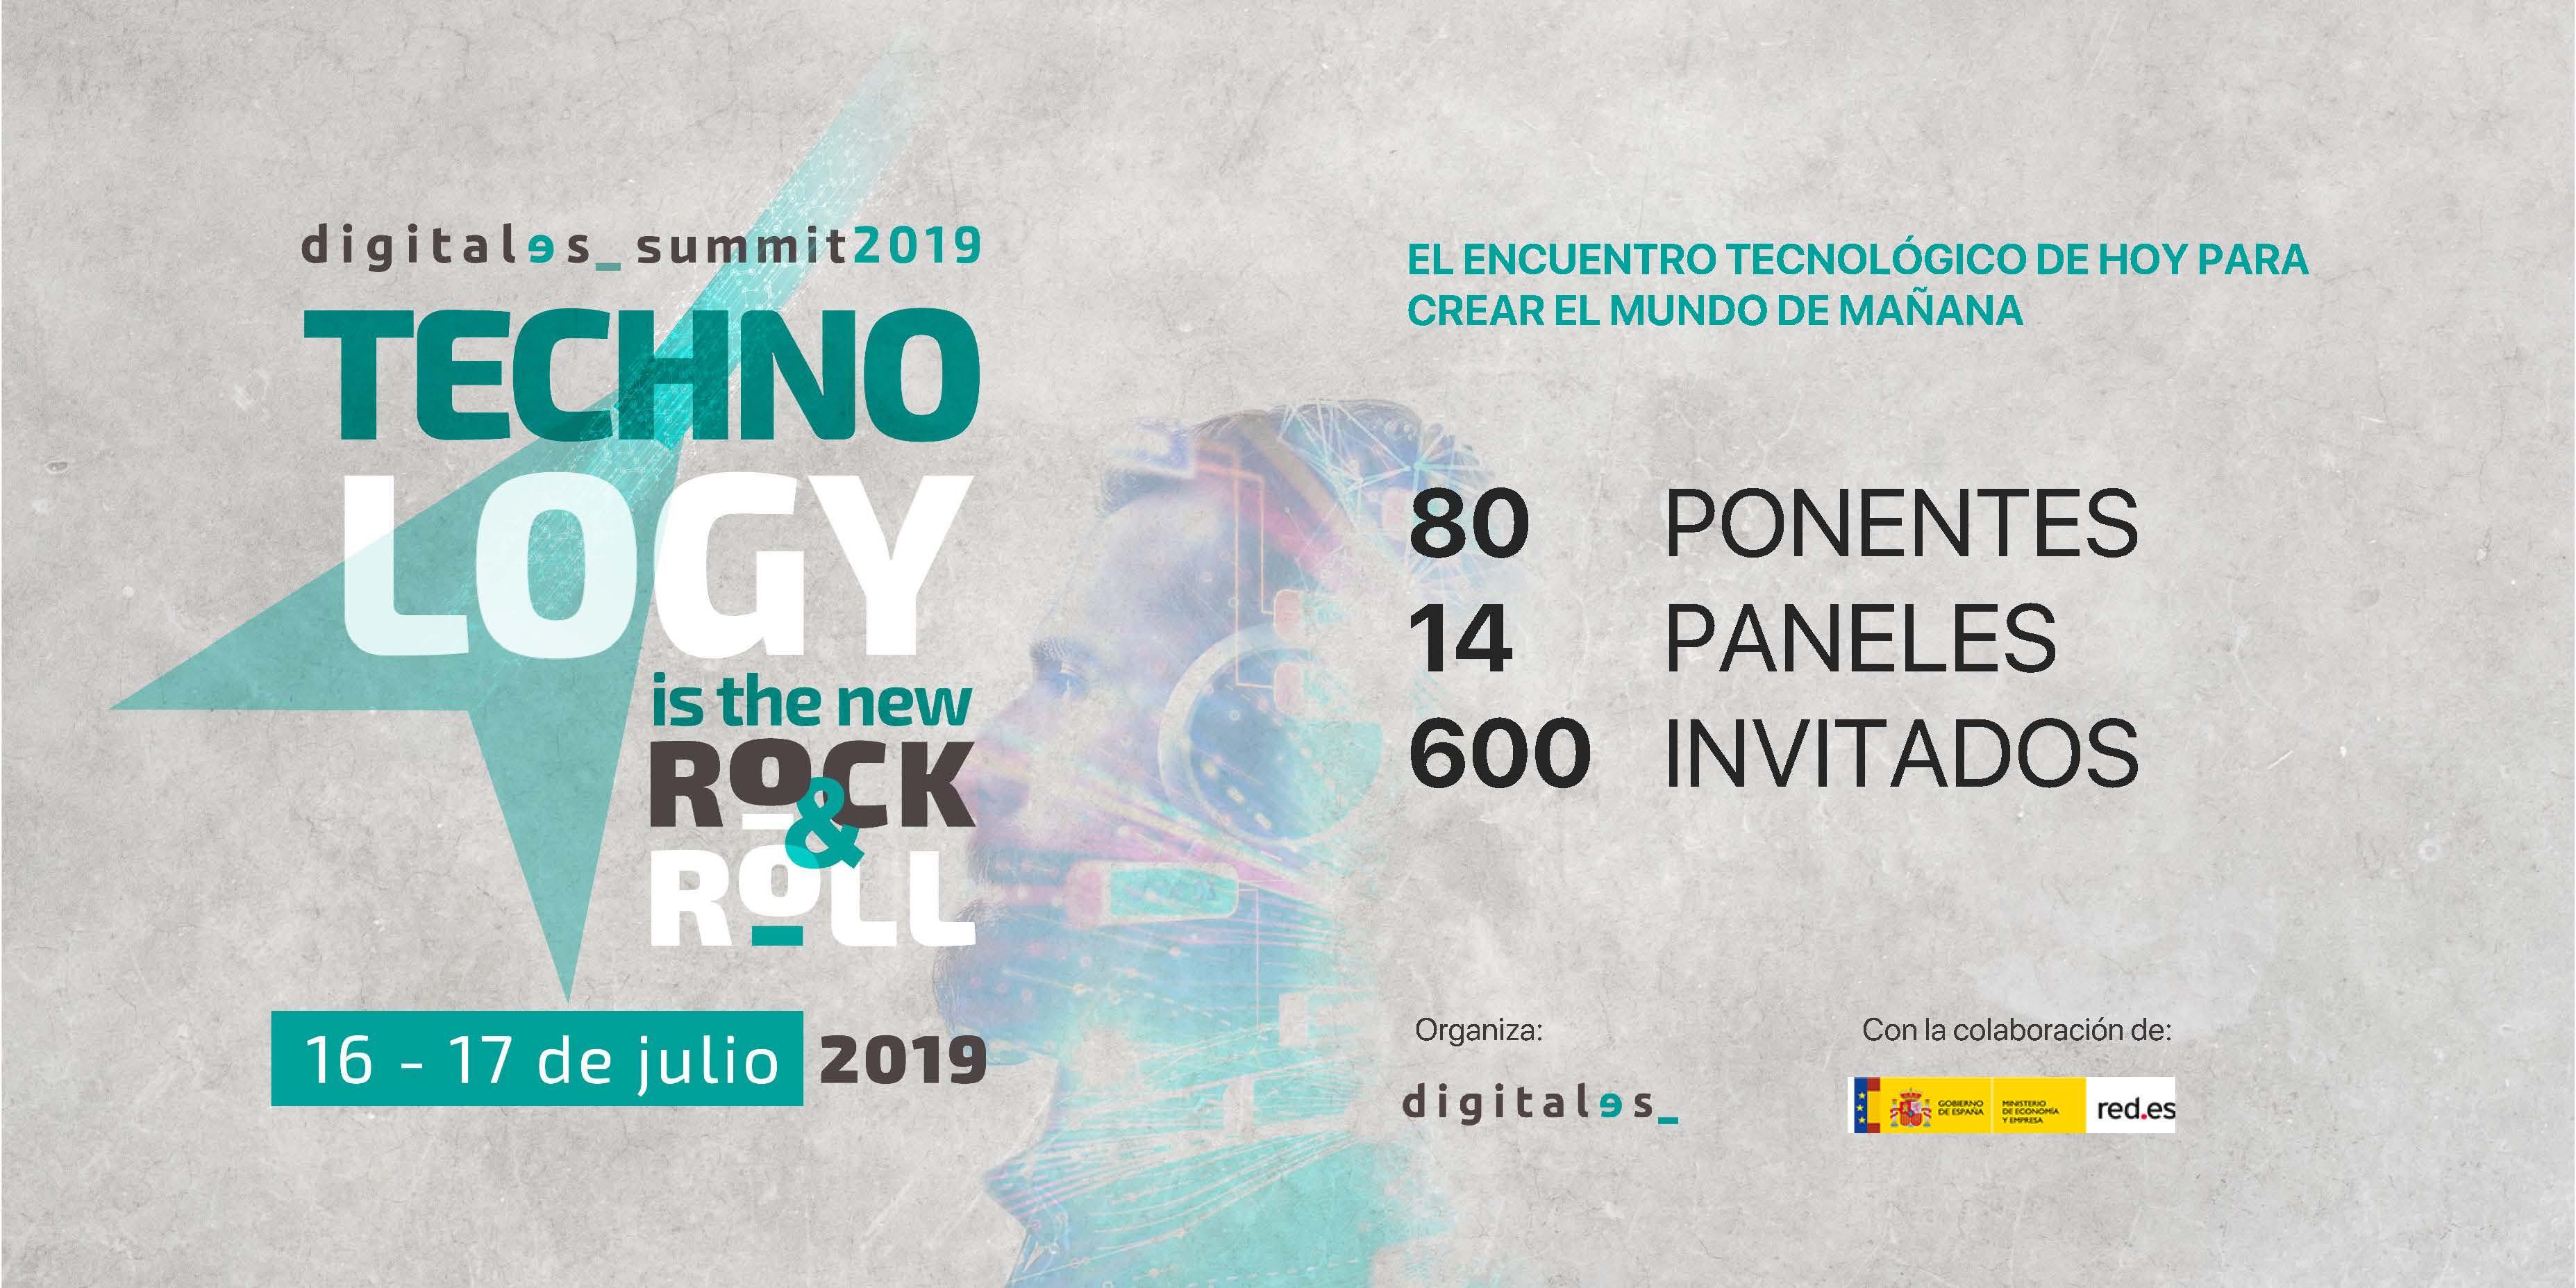 Digitales Summit 2019 video teaser